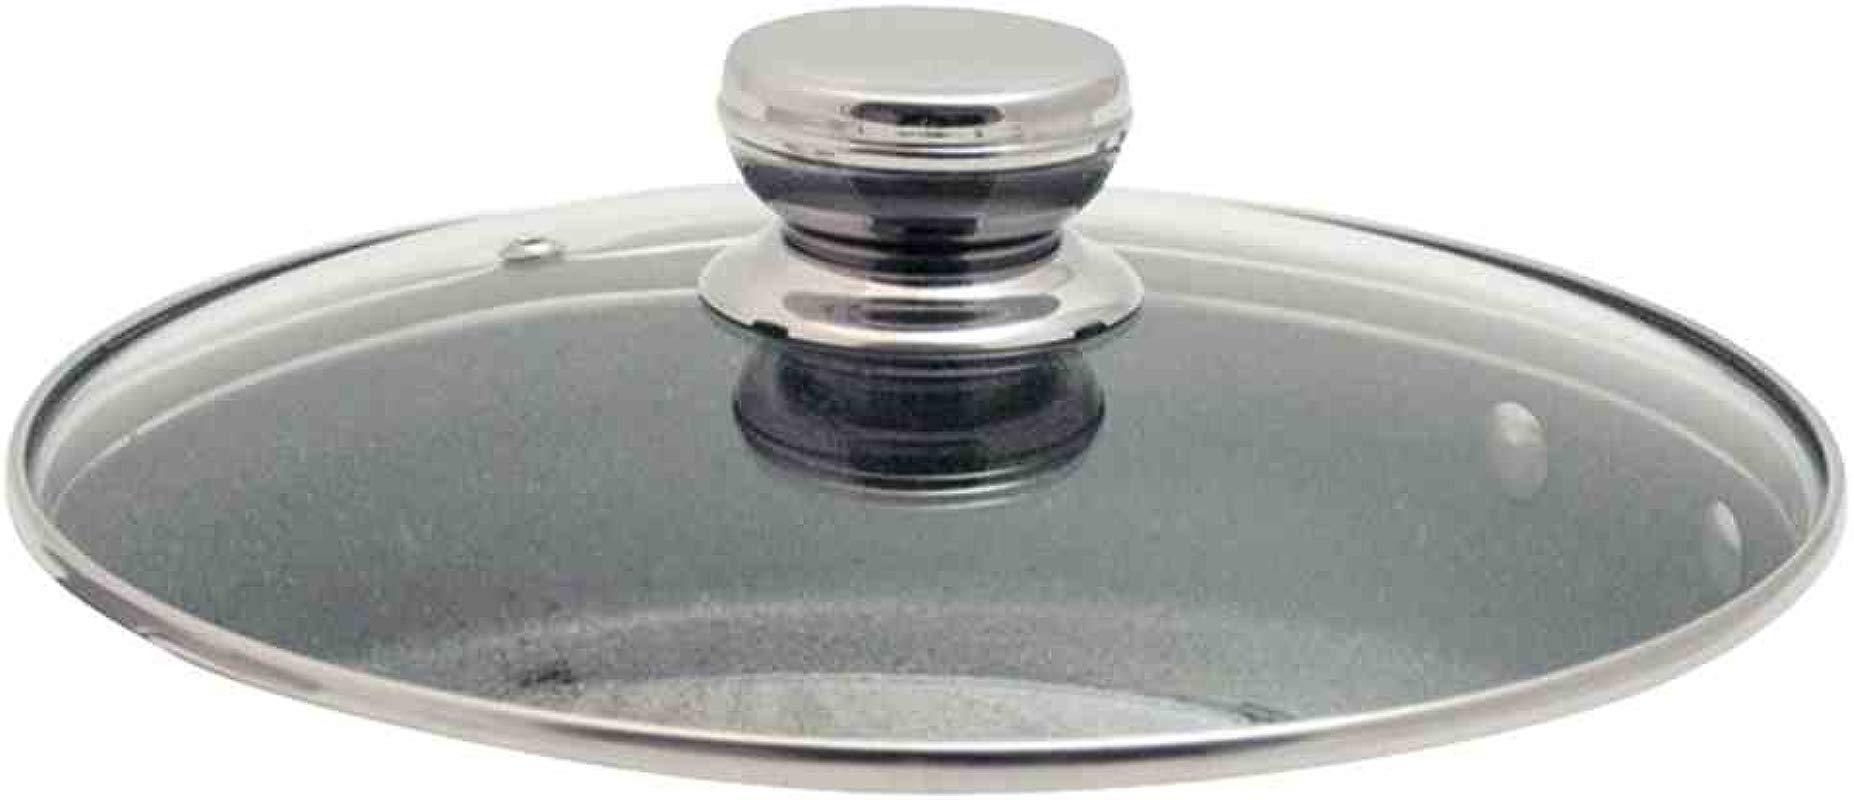 Ballarini Portofino Pt4 F2 24 Glass Lid 24 Cm Clear 6 X 25 X 25 Cm